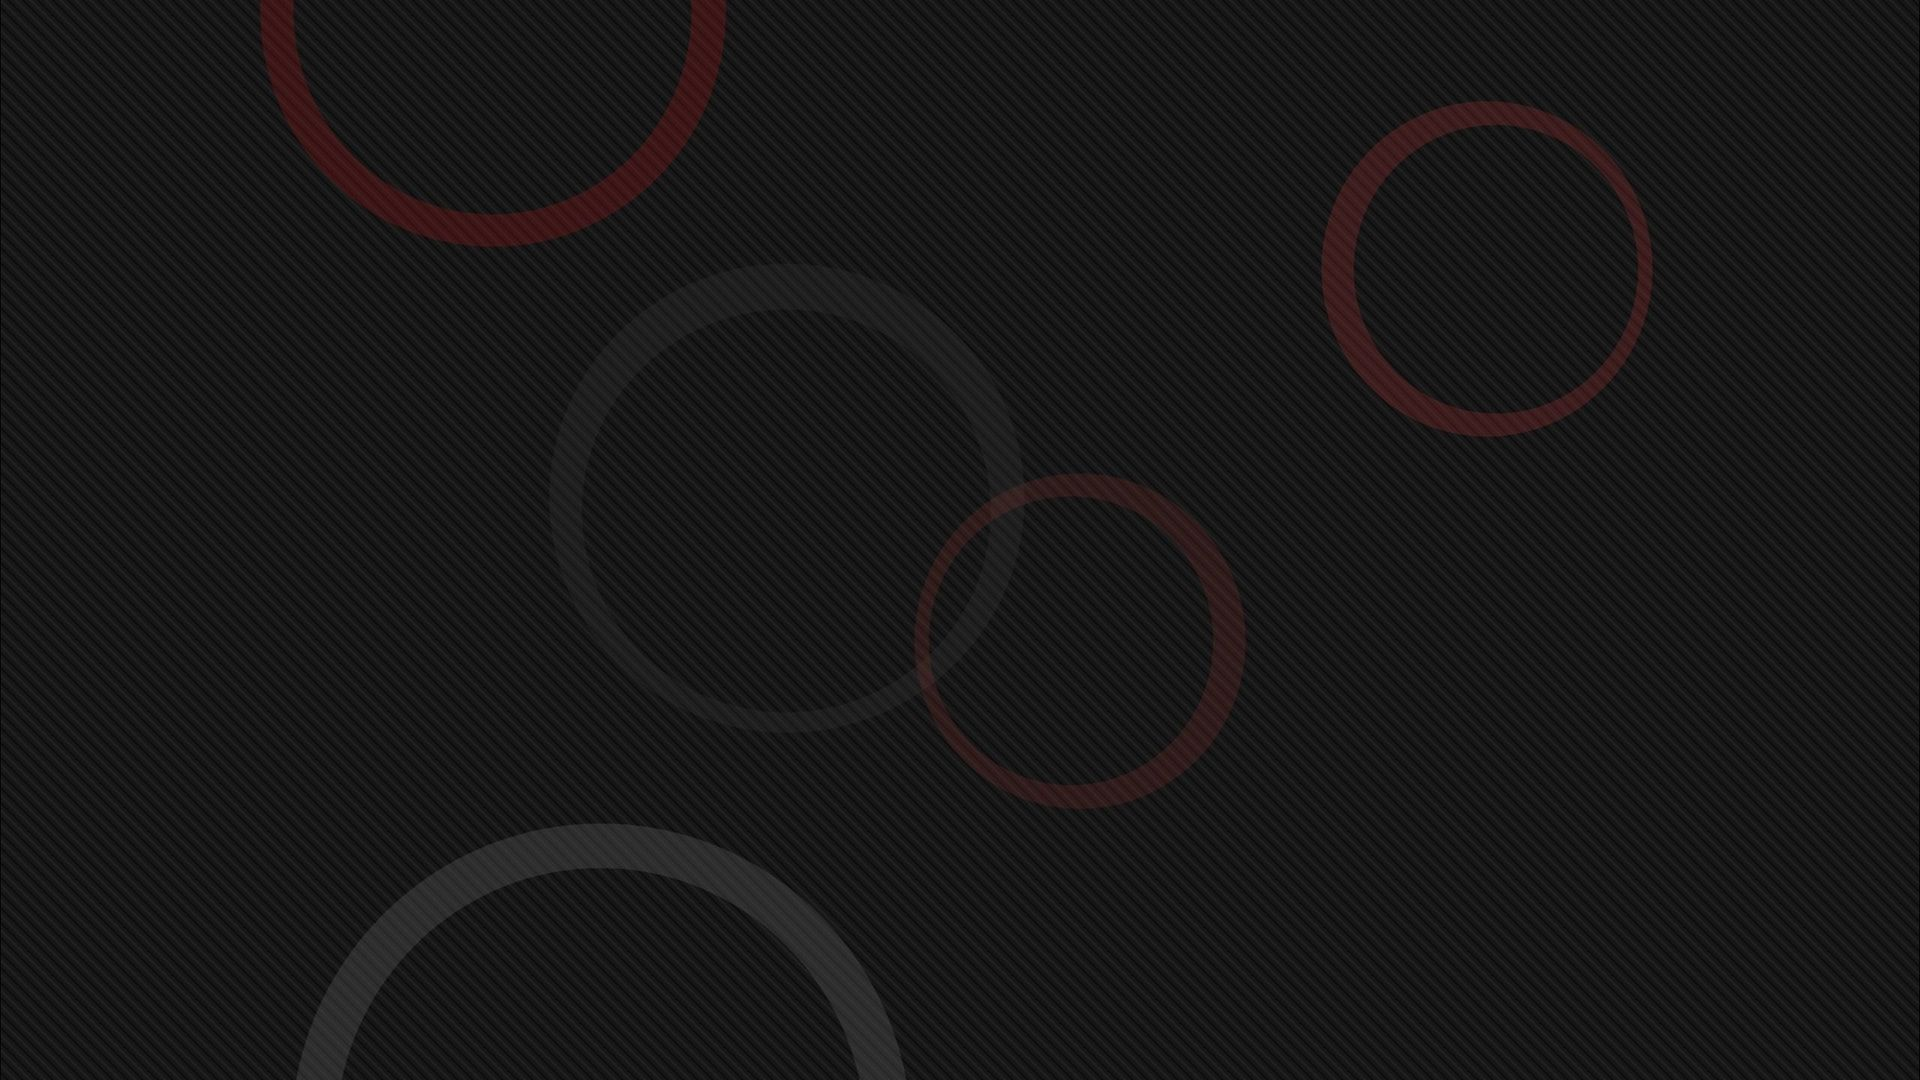 Download Red and gray circles wallpaper 1920x1080